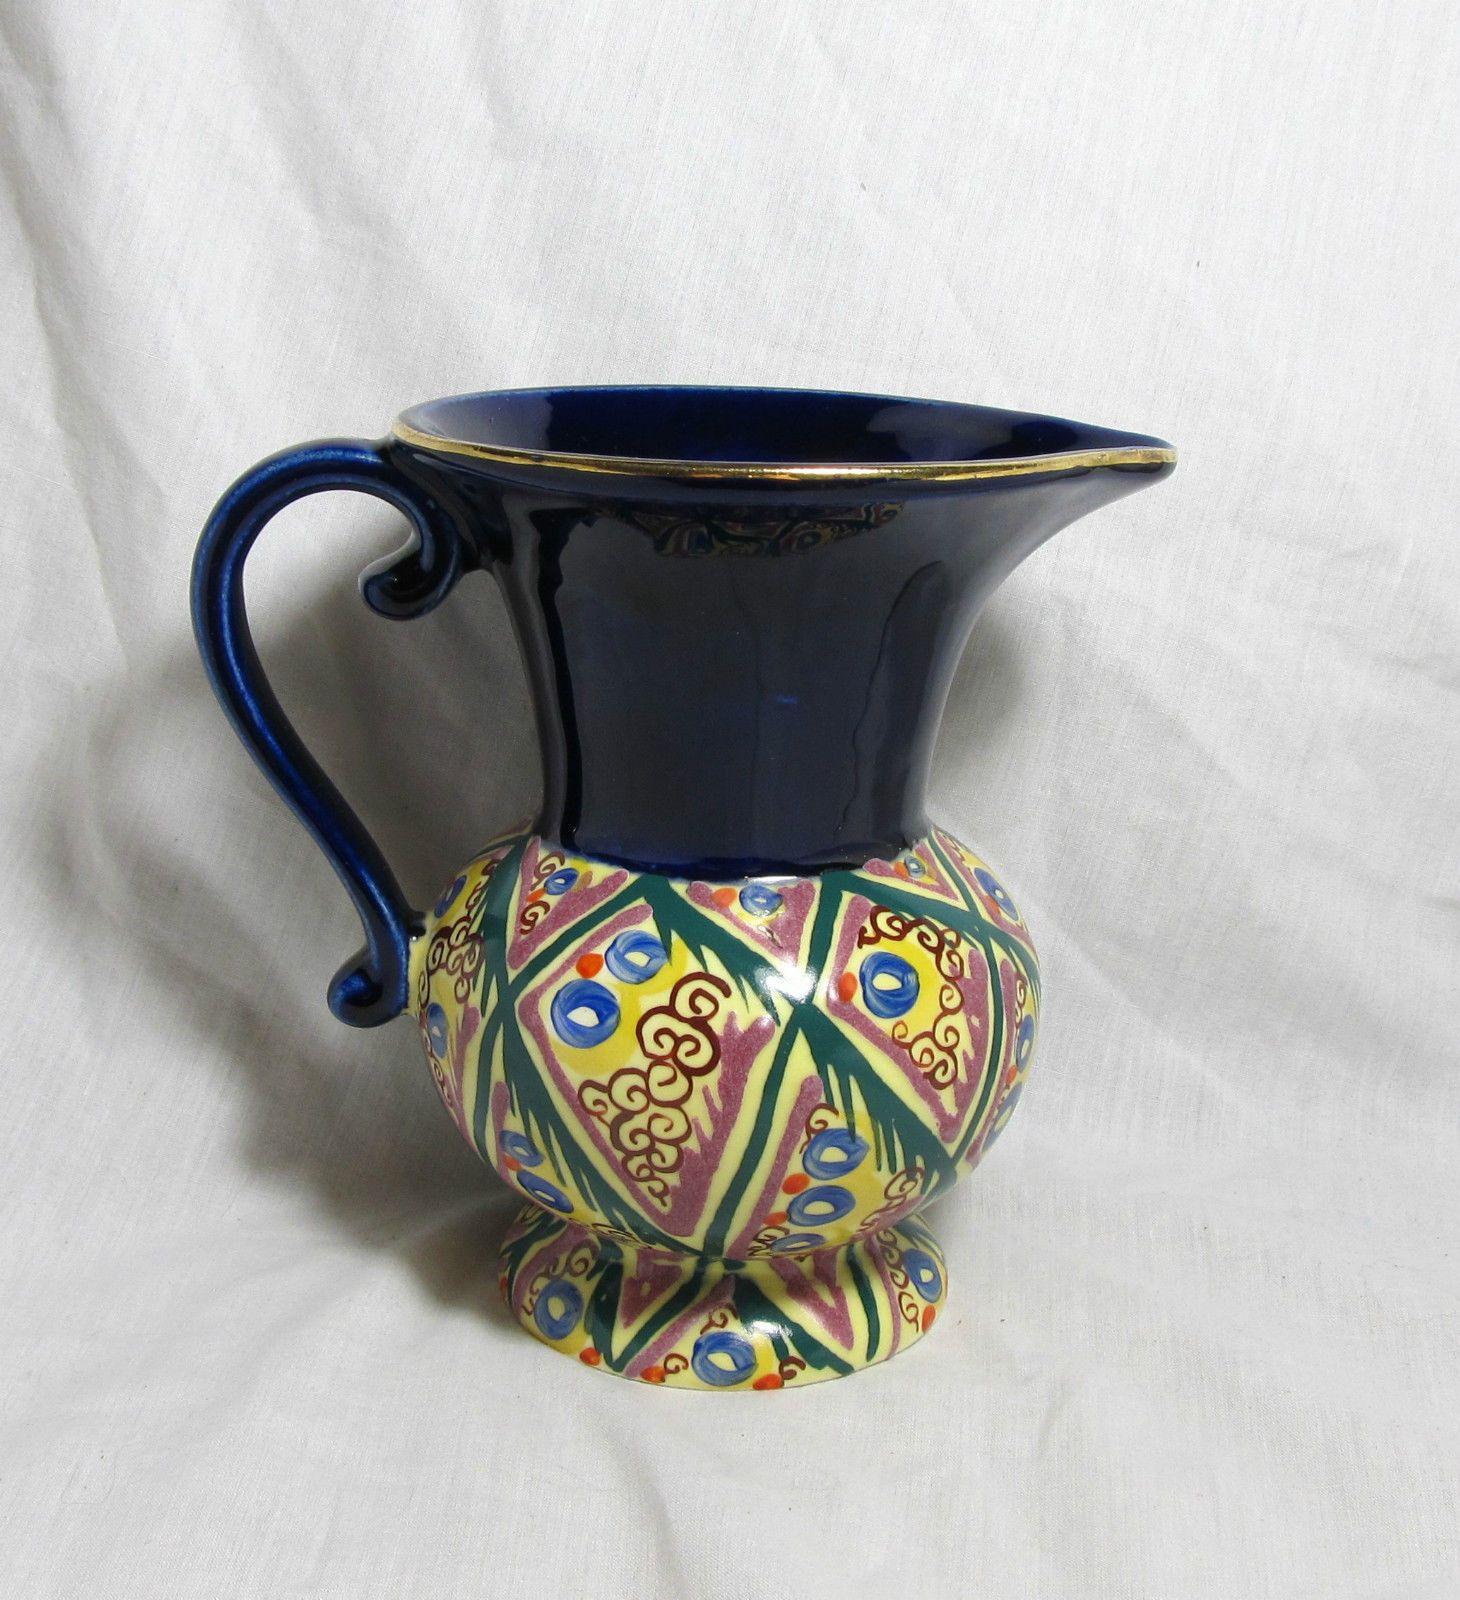 Vintage Czech Art Deco Lostro Ditmar Urbach Art Pottery 1 2 Liter Pitcher Signed | eBay